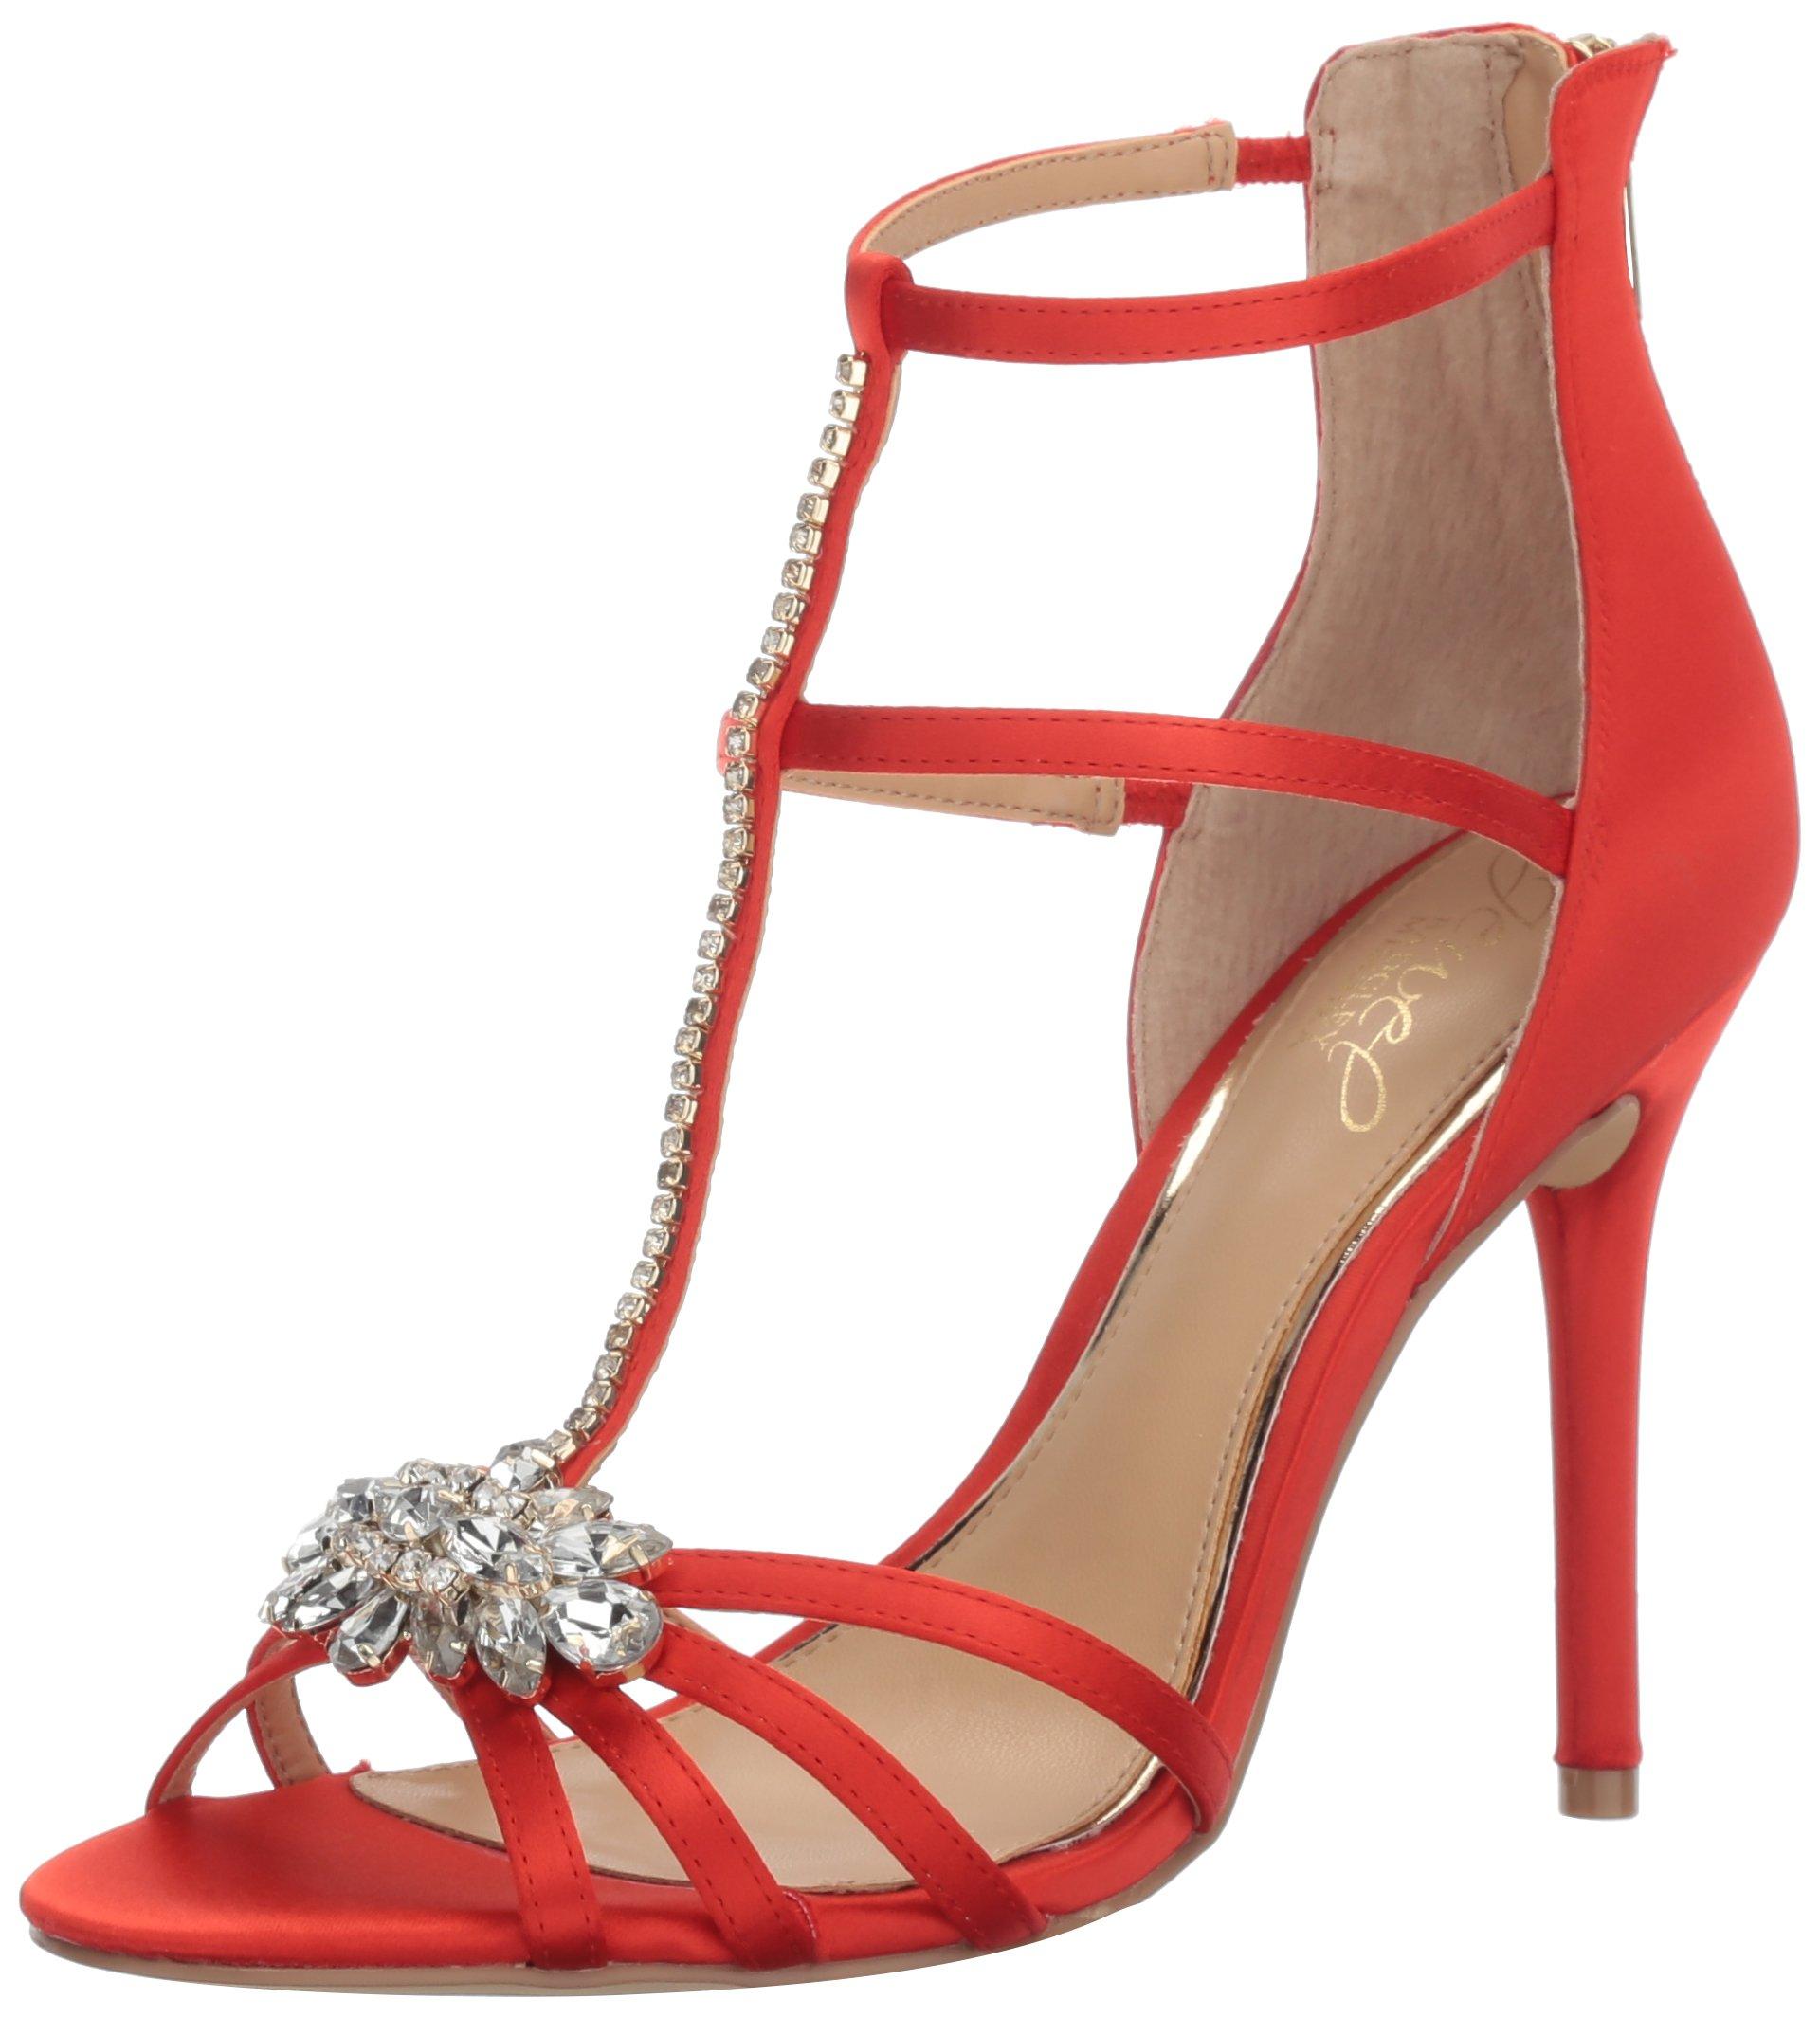 Badgley Mischka Jewel Women's Hazel Dress Sandal, Red, 6.5 M US